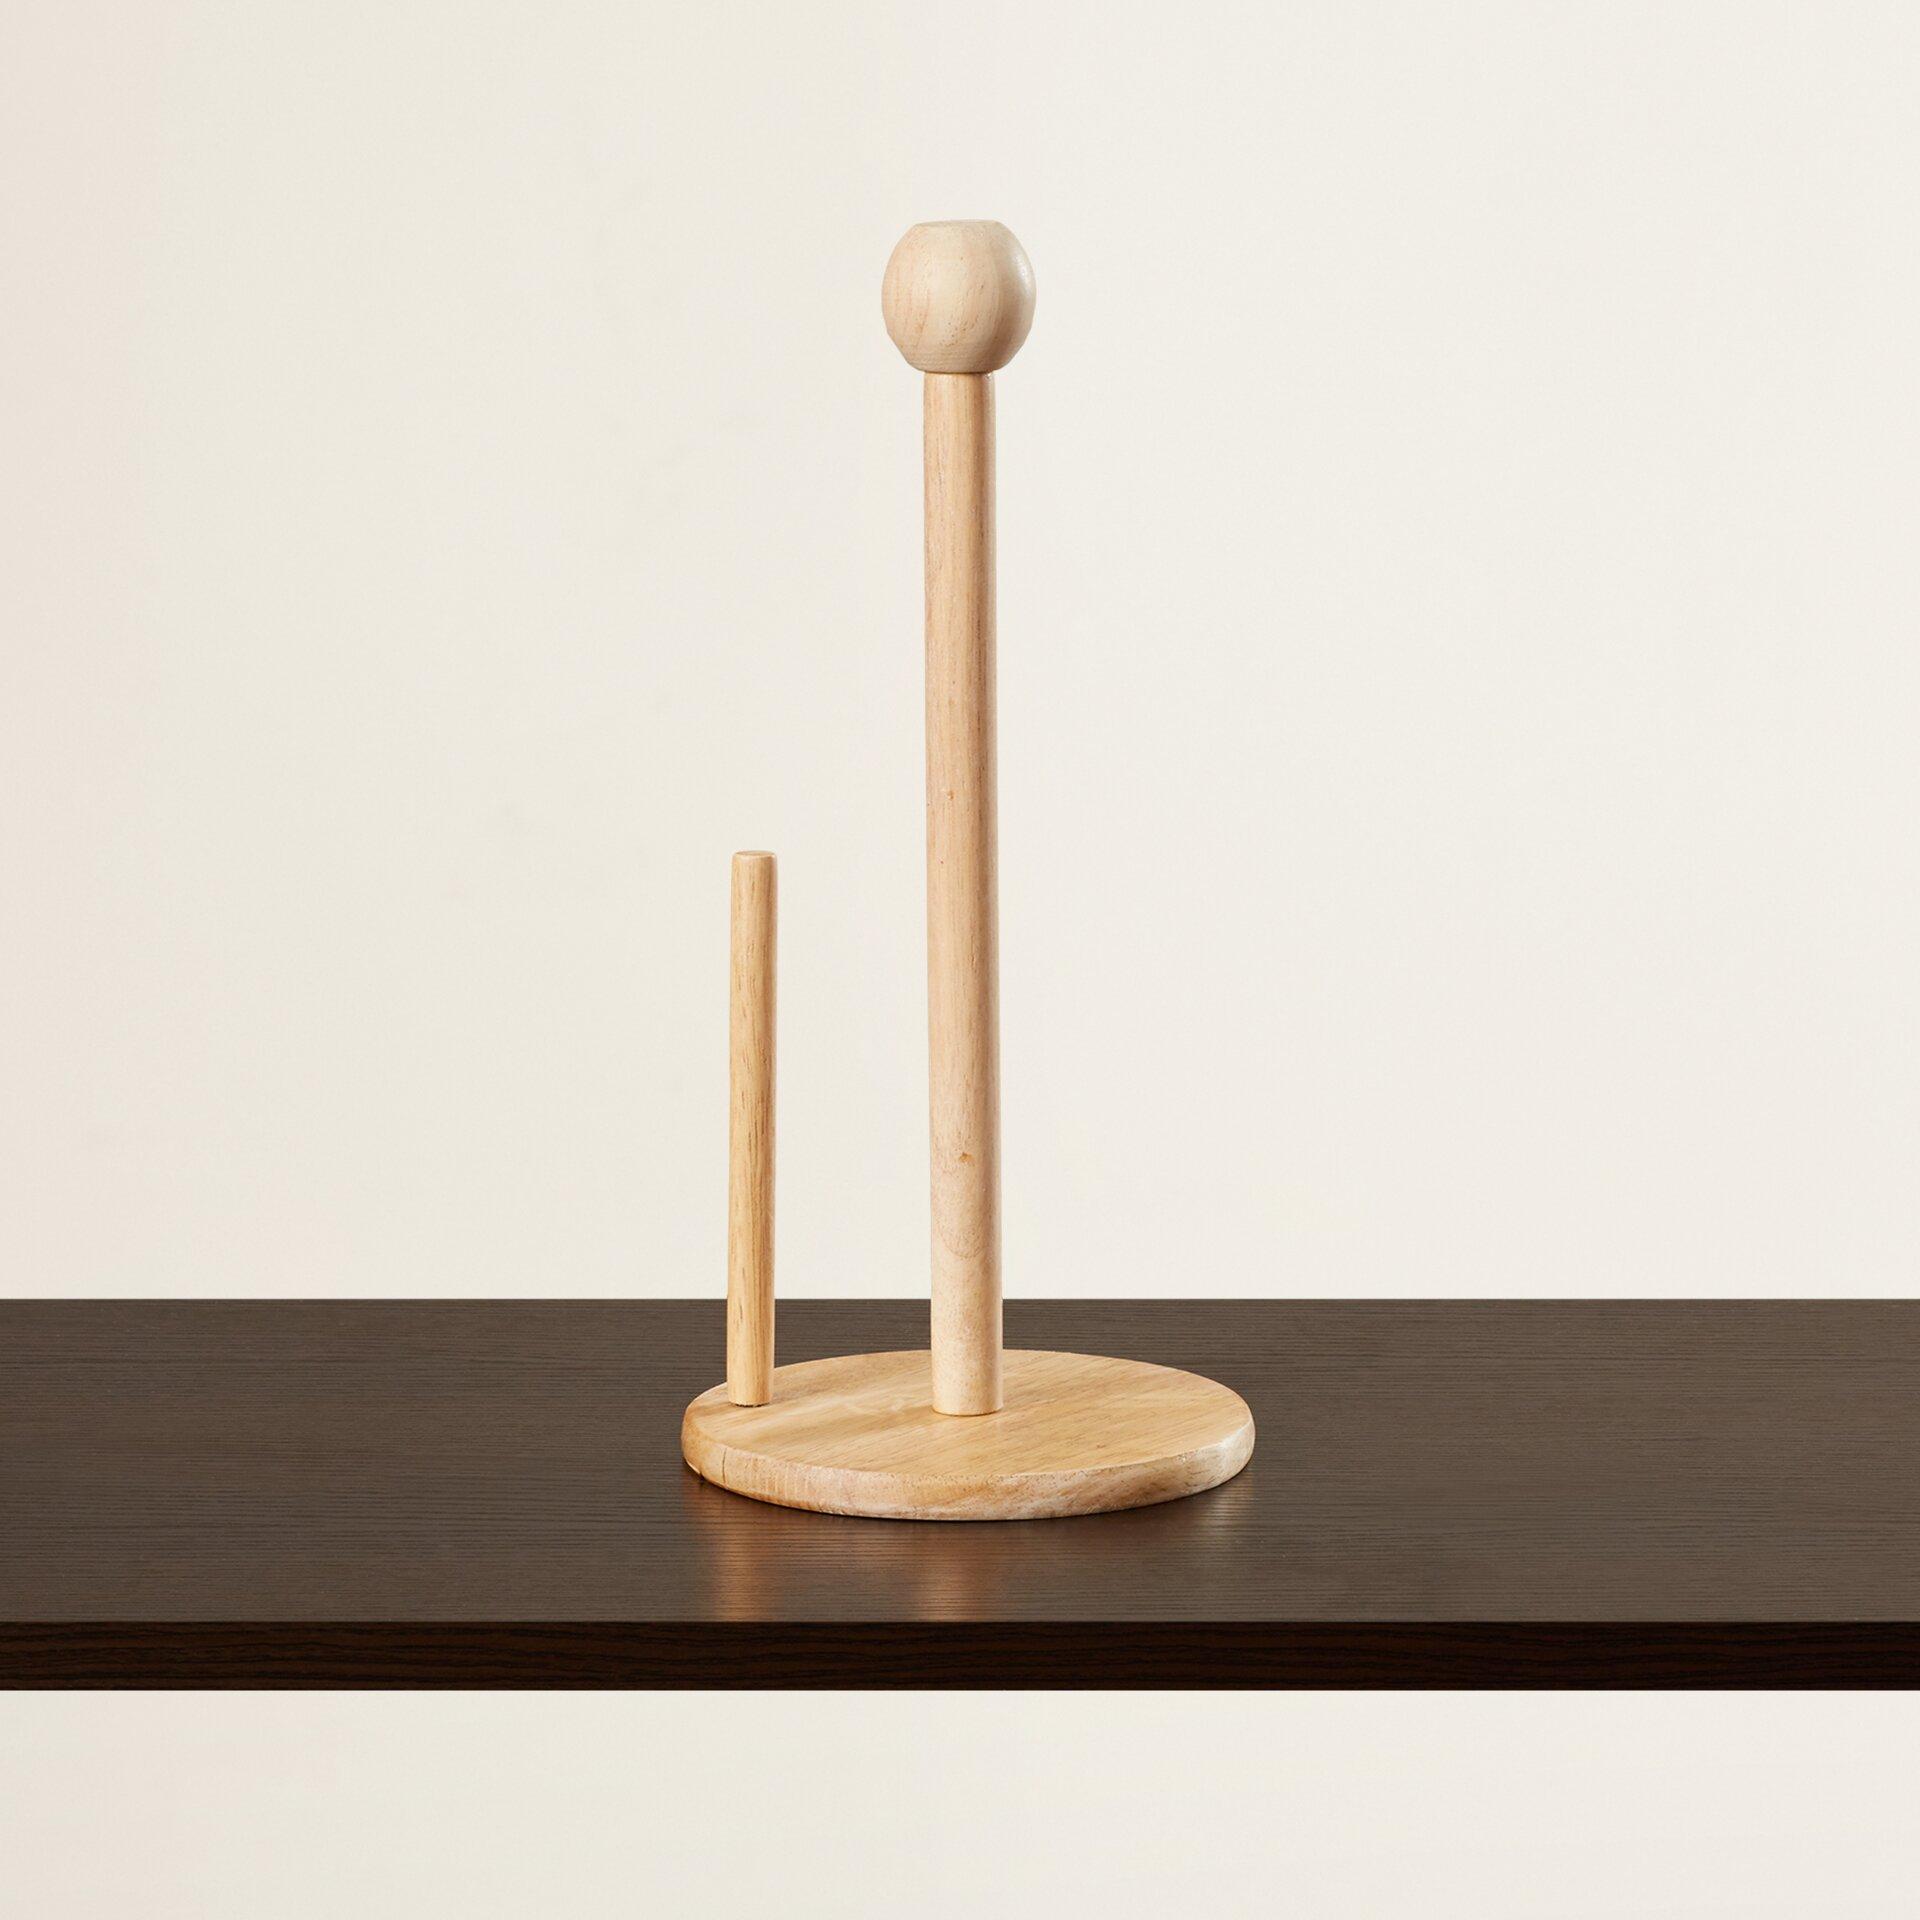 andover mills countertop vertical paper towel holder reviews wayfair. Black Bedroom Furniture Sets. Home Design Ideas